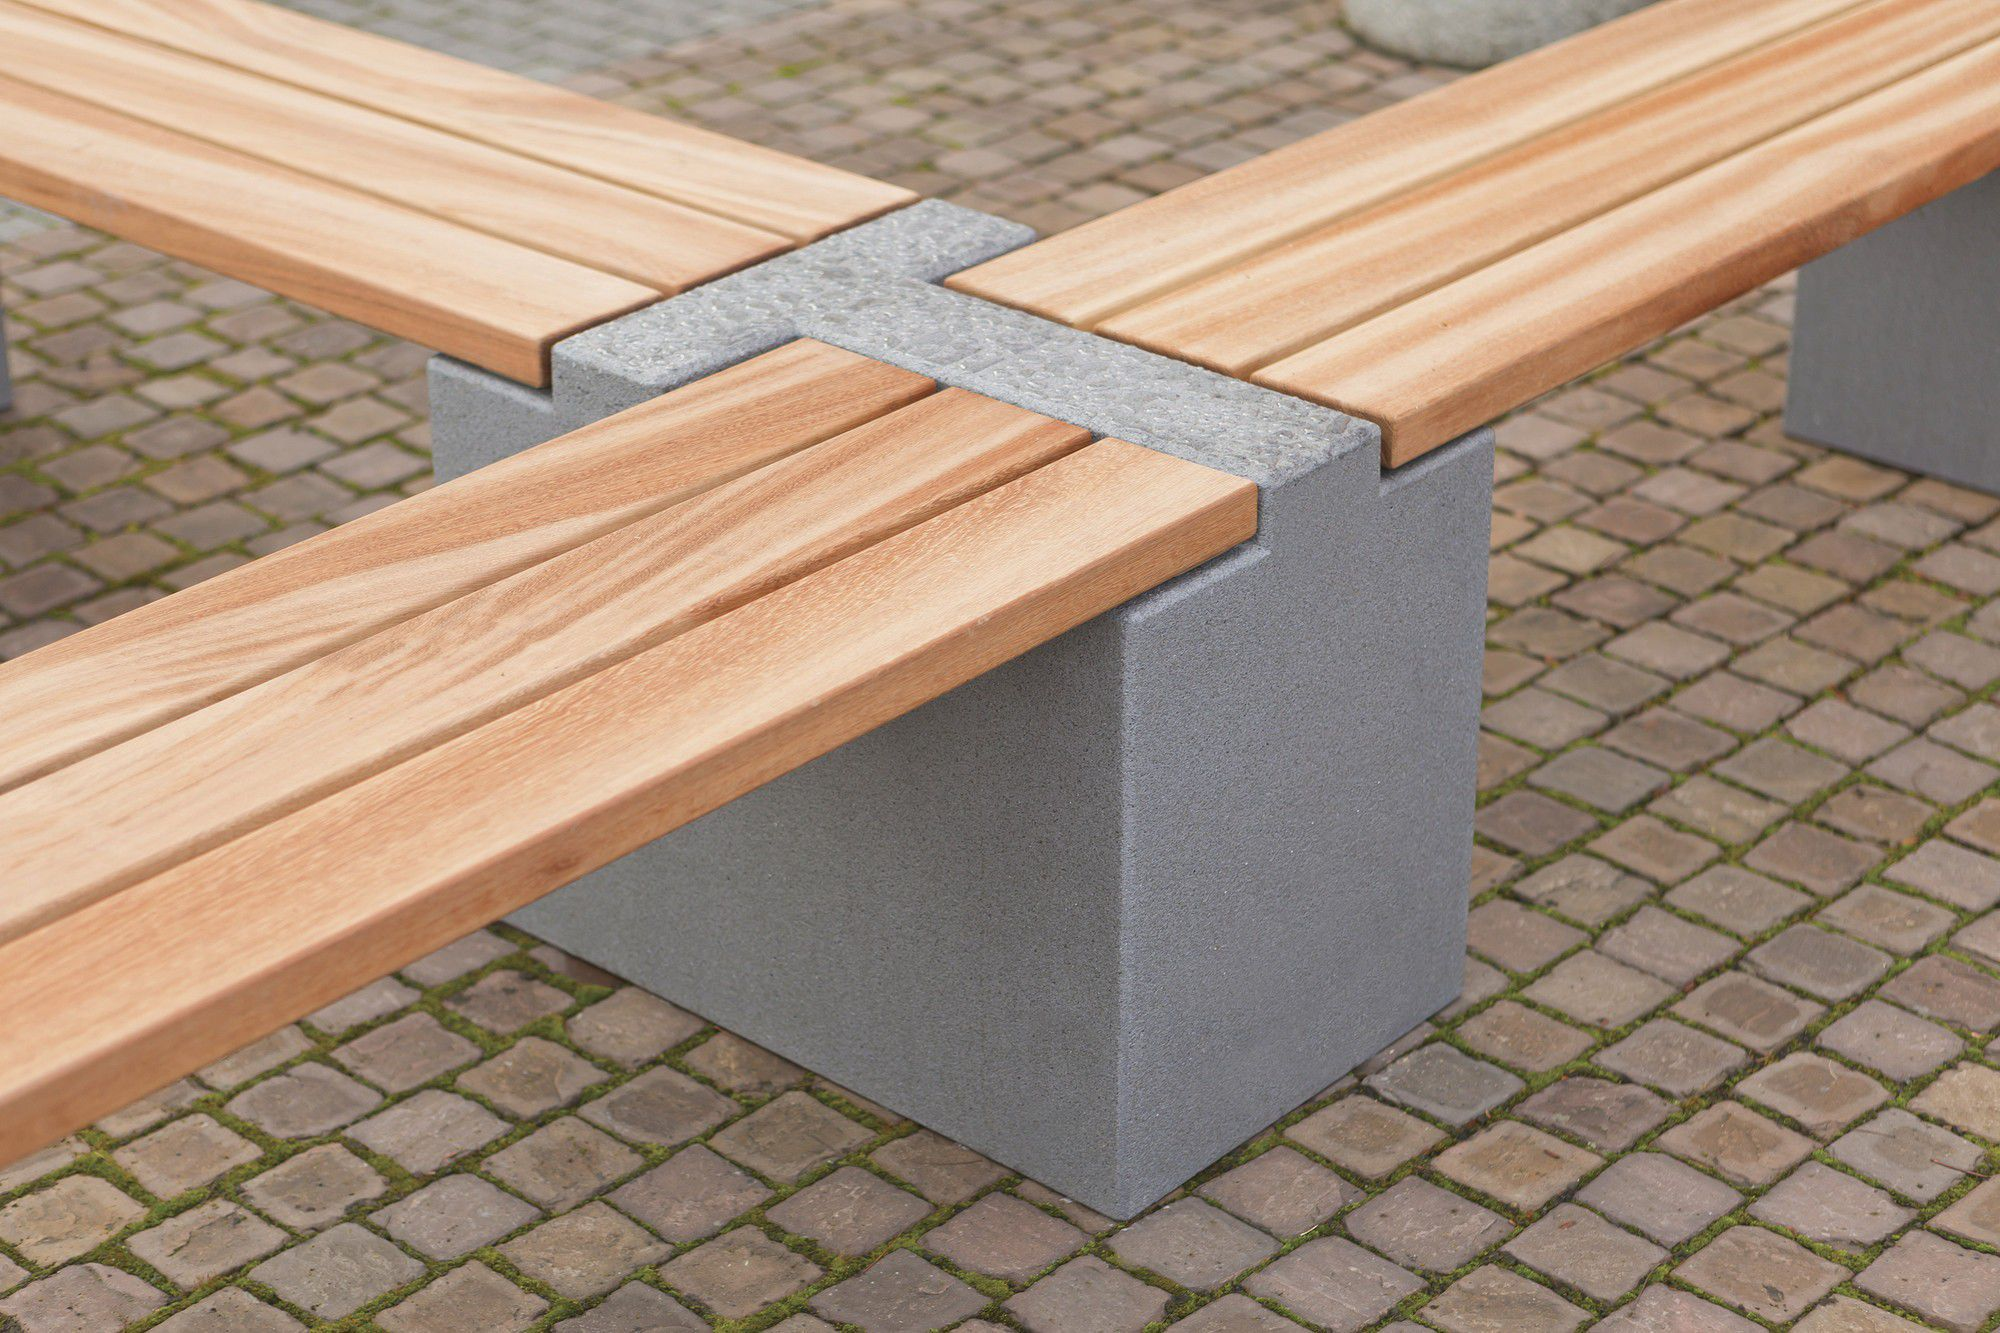 Gartenbank modern beton  Bank für den Garten / modern / Holz / Stein - TRIC - Rinn Beton ...